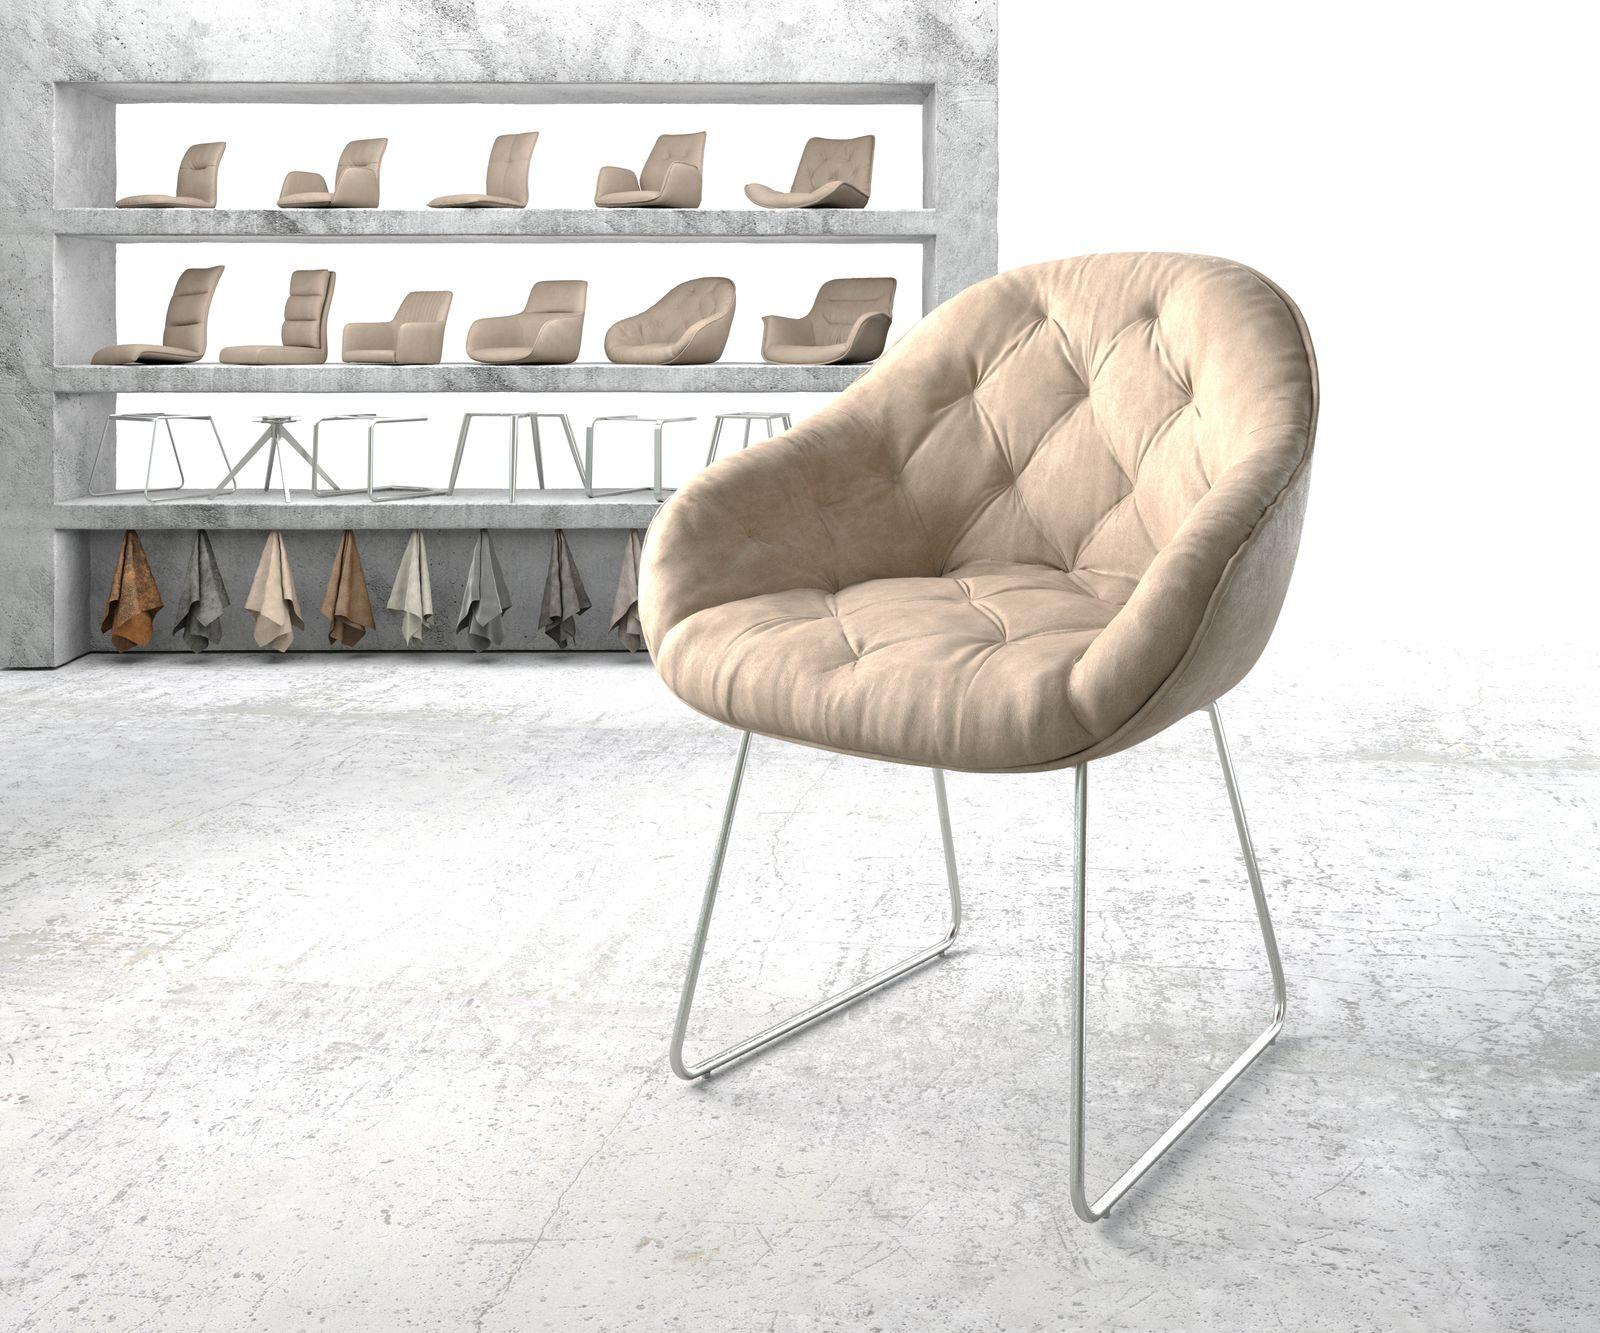 delife-armlehnstuhl-gaio-flex-beige-vintage-kufengestell-edelstahl-esszimmerstuhle